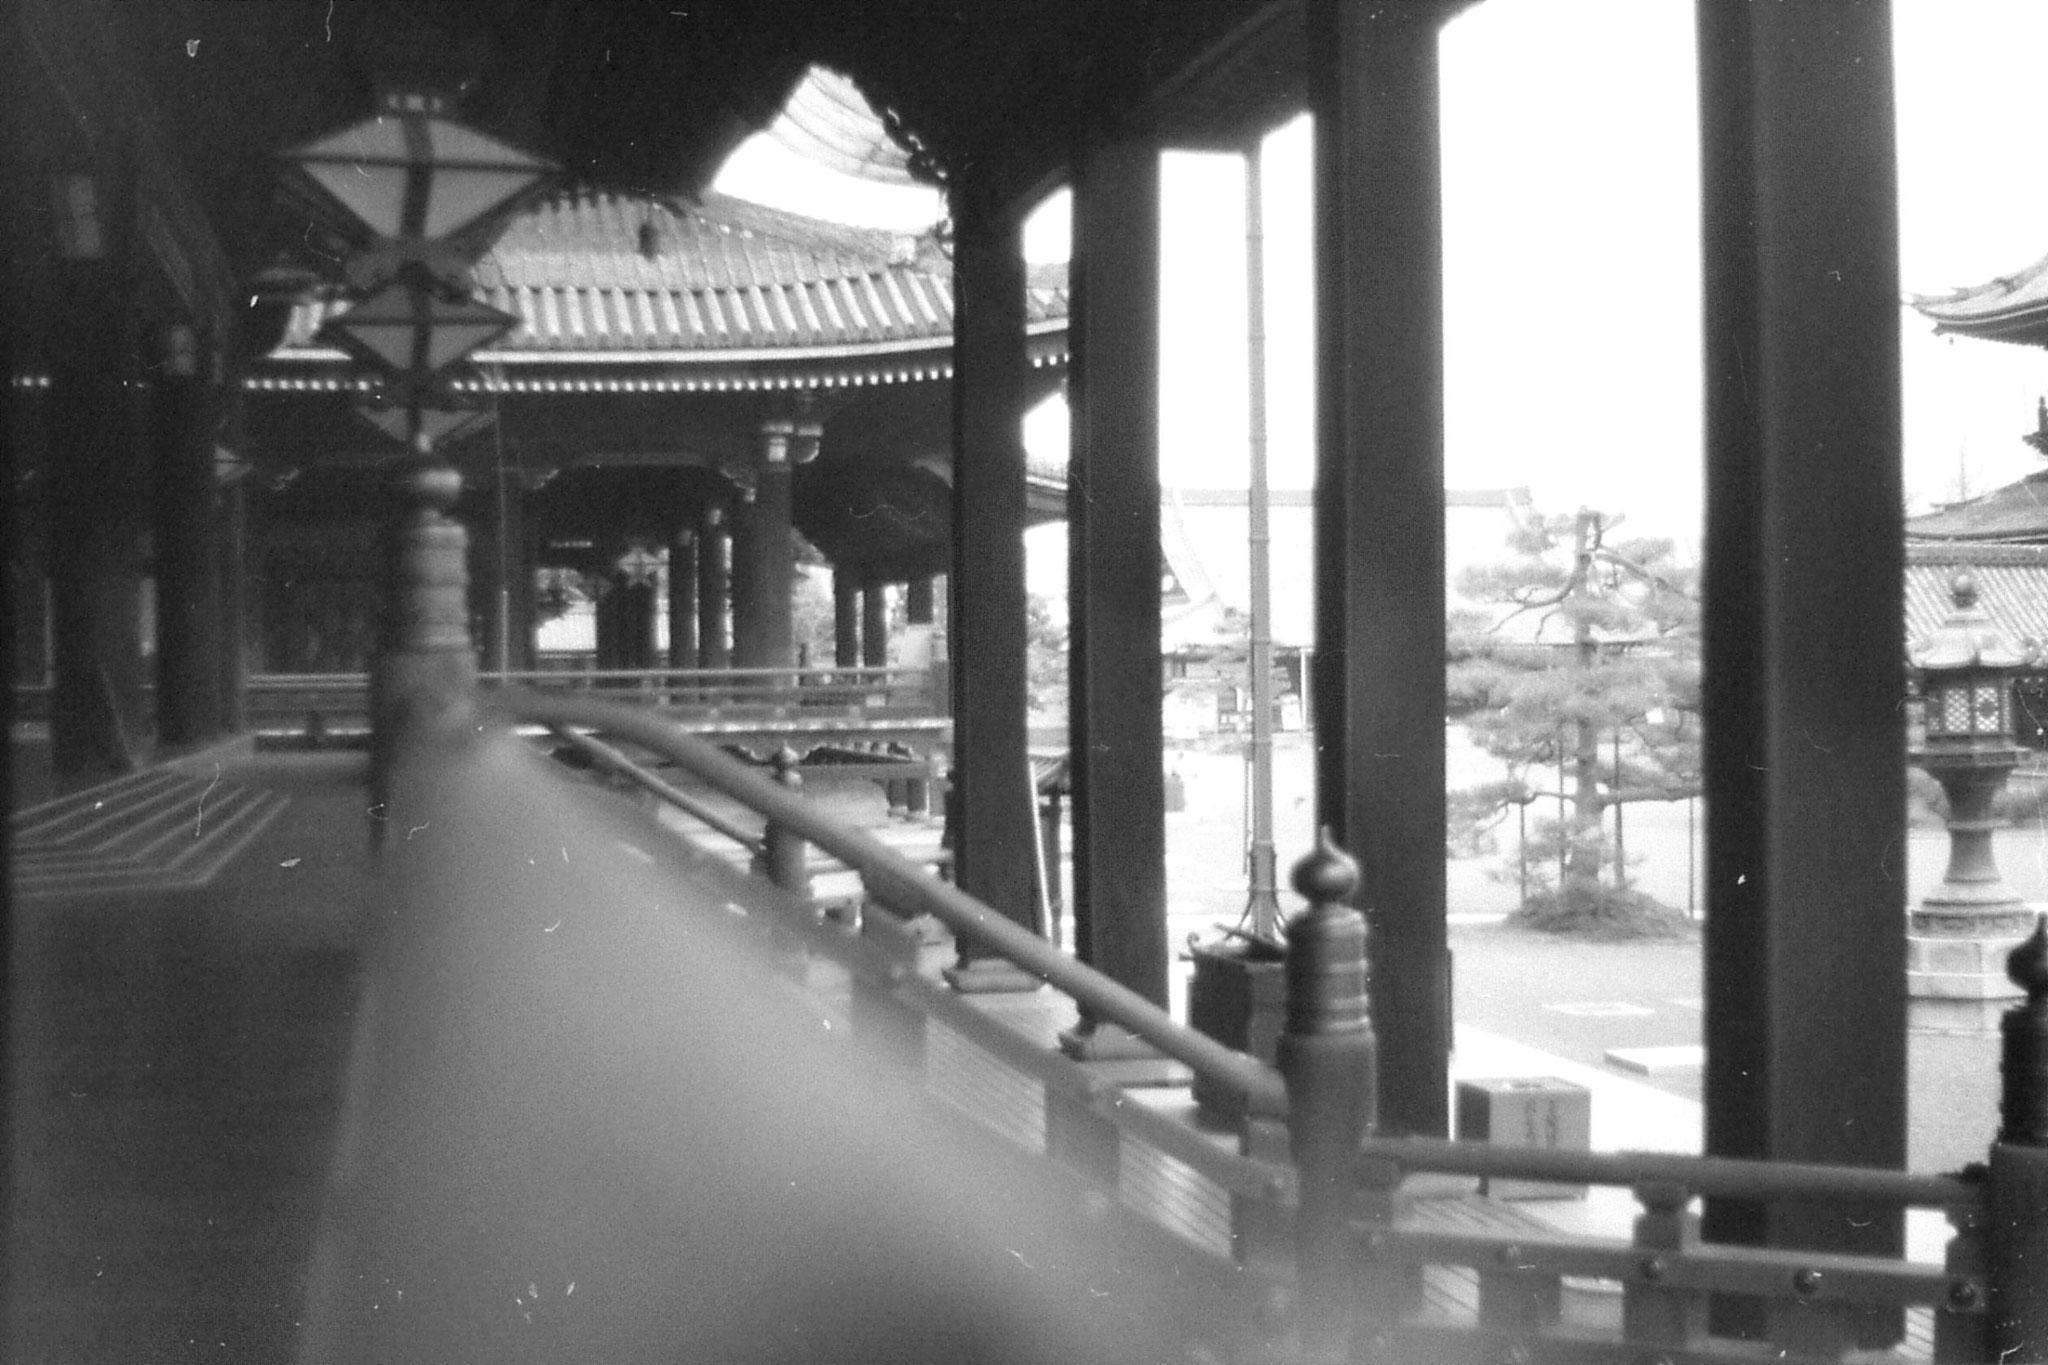 26/1/1989: 3: Kyoto,, Higashi, Honganji temple